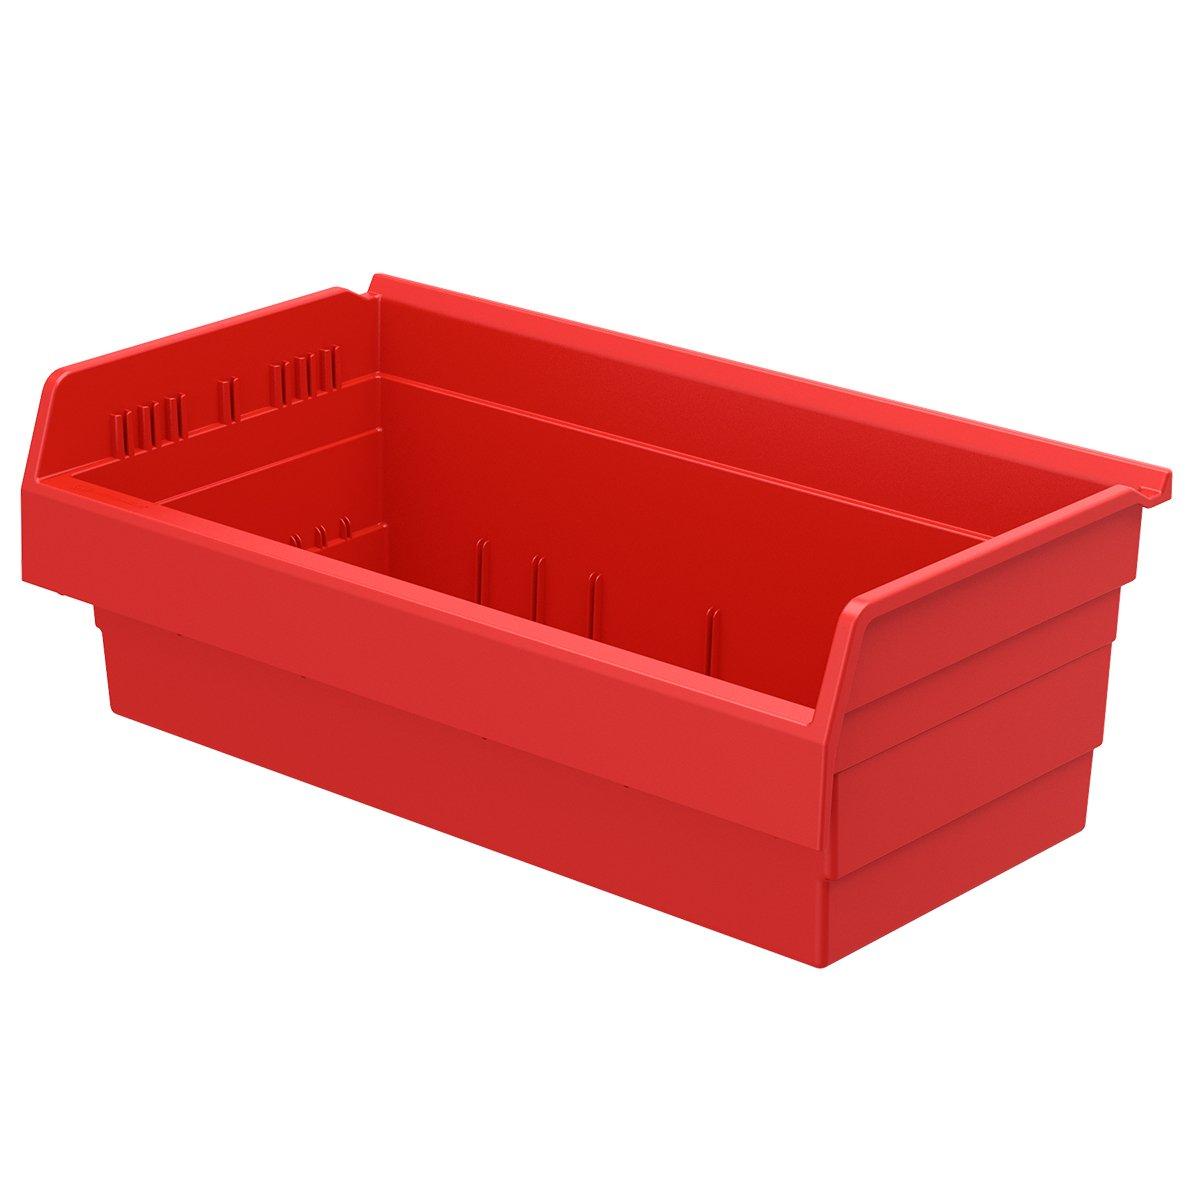 Akro-Mils 30820 ShelfMax 8 Plastic Nesting Shelf Bin Box, 12-Inch x 22-Inch x 8-Inch, Red, 4-Pack